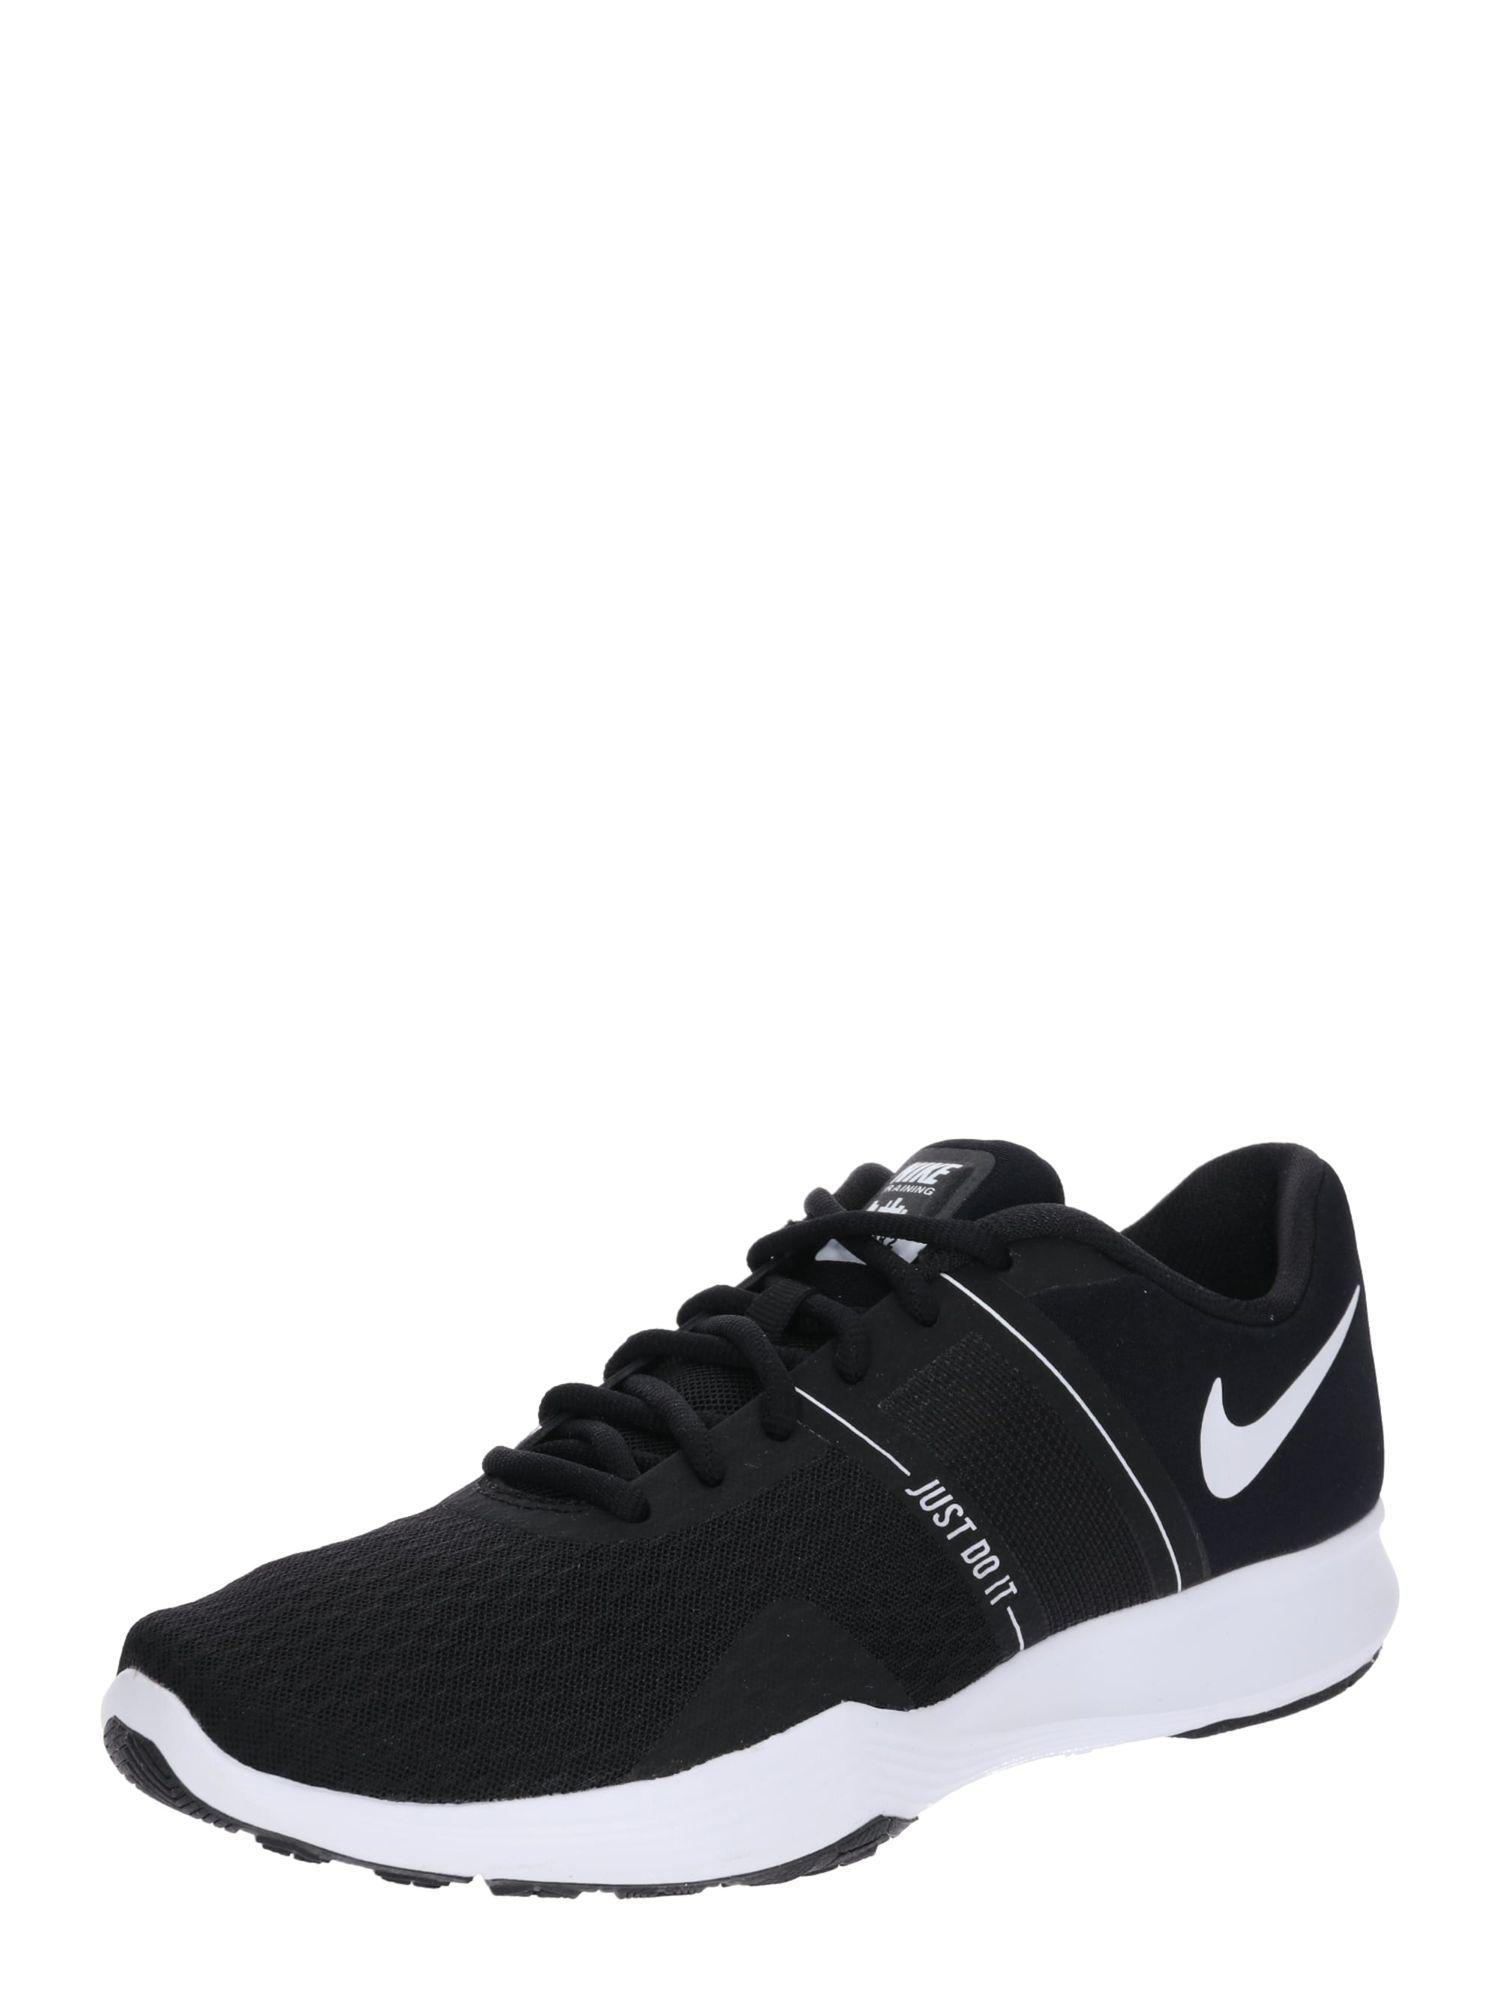 Schuhe ´City Trainer 2´